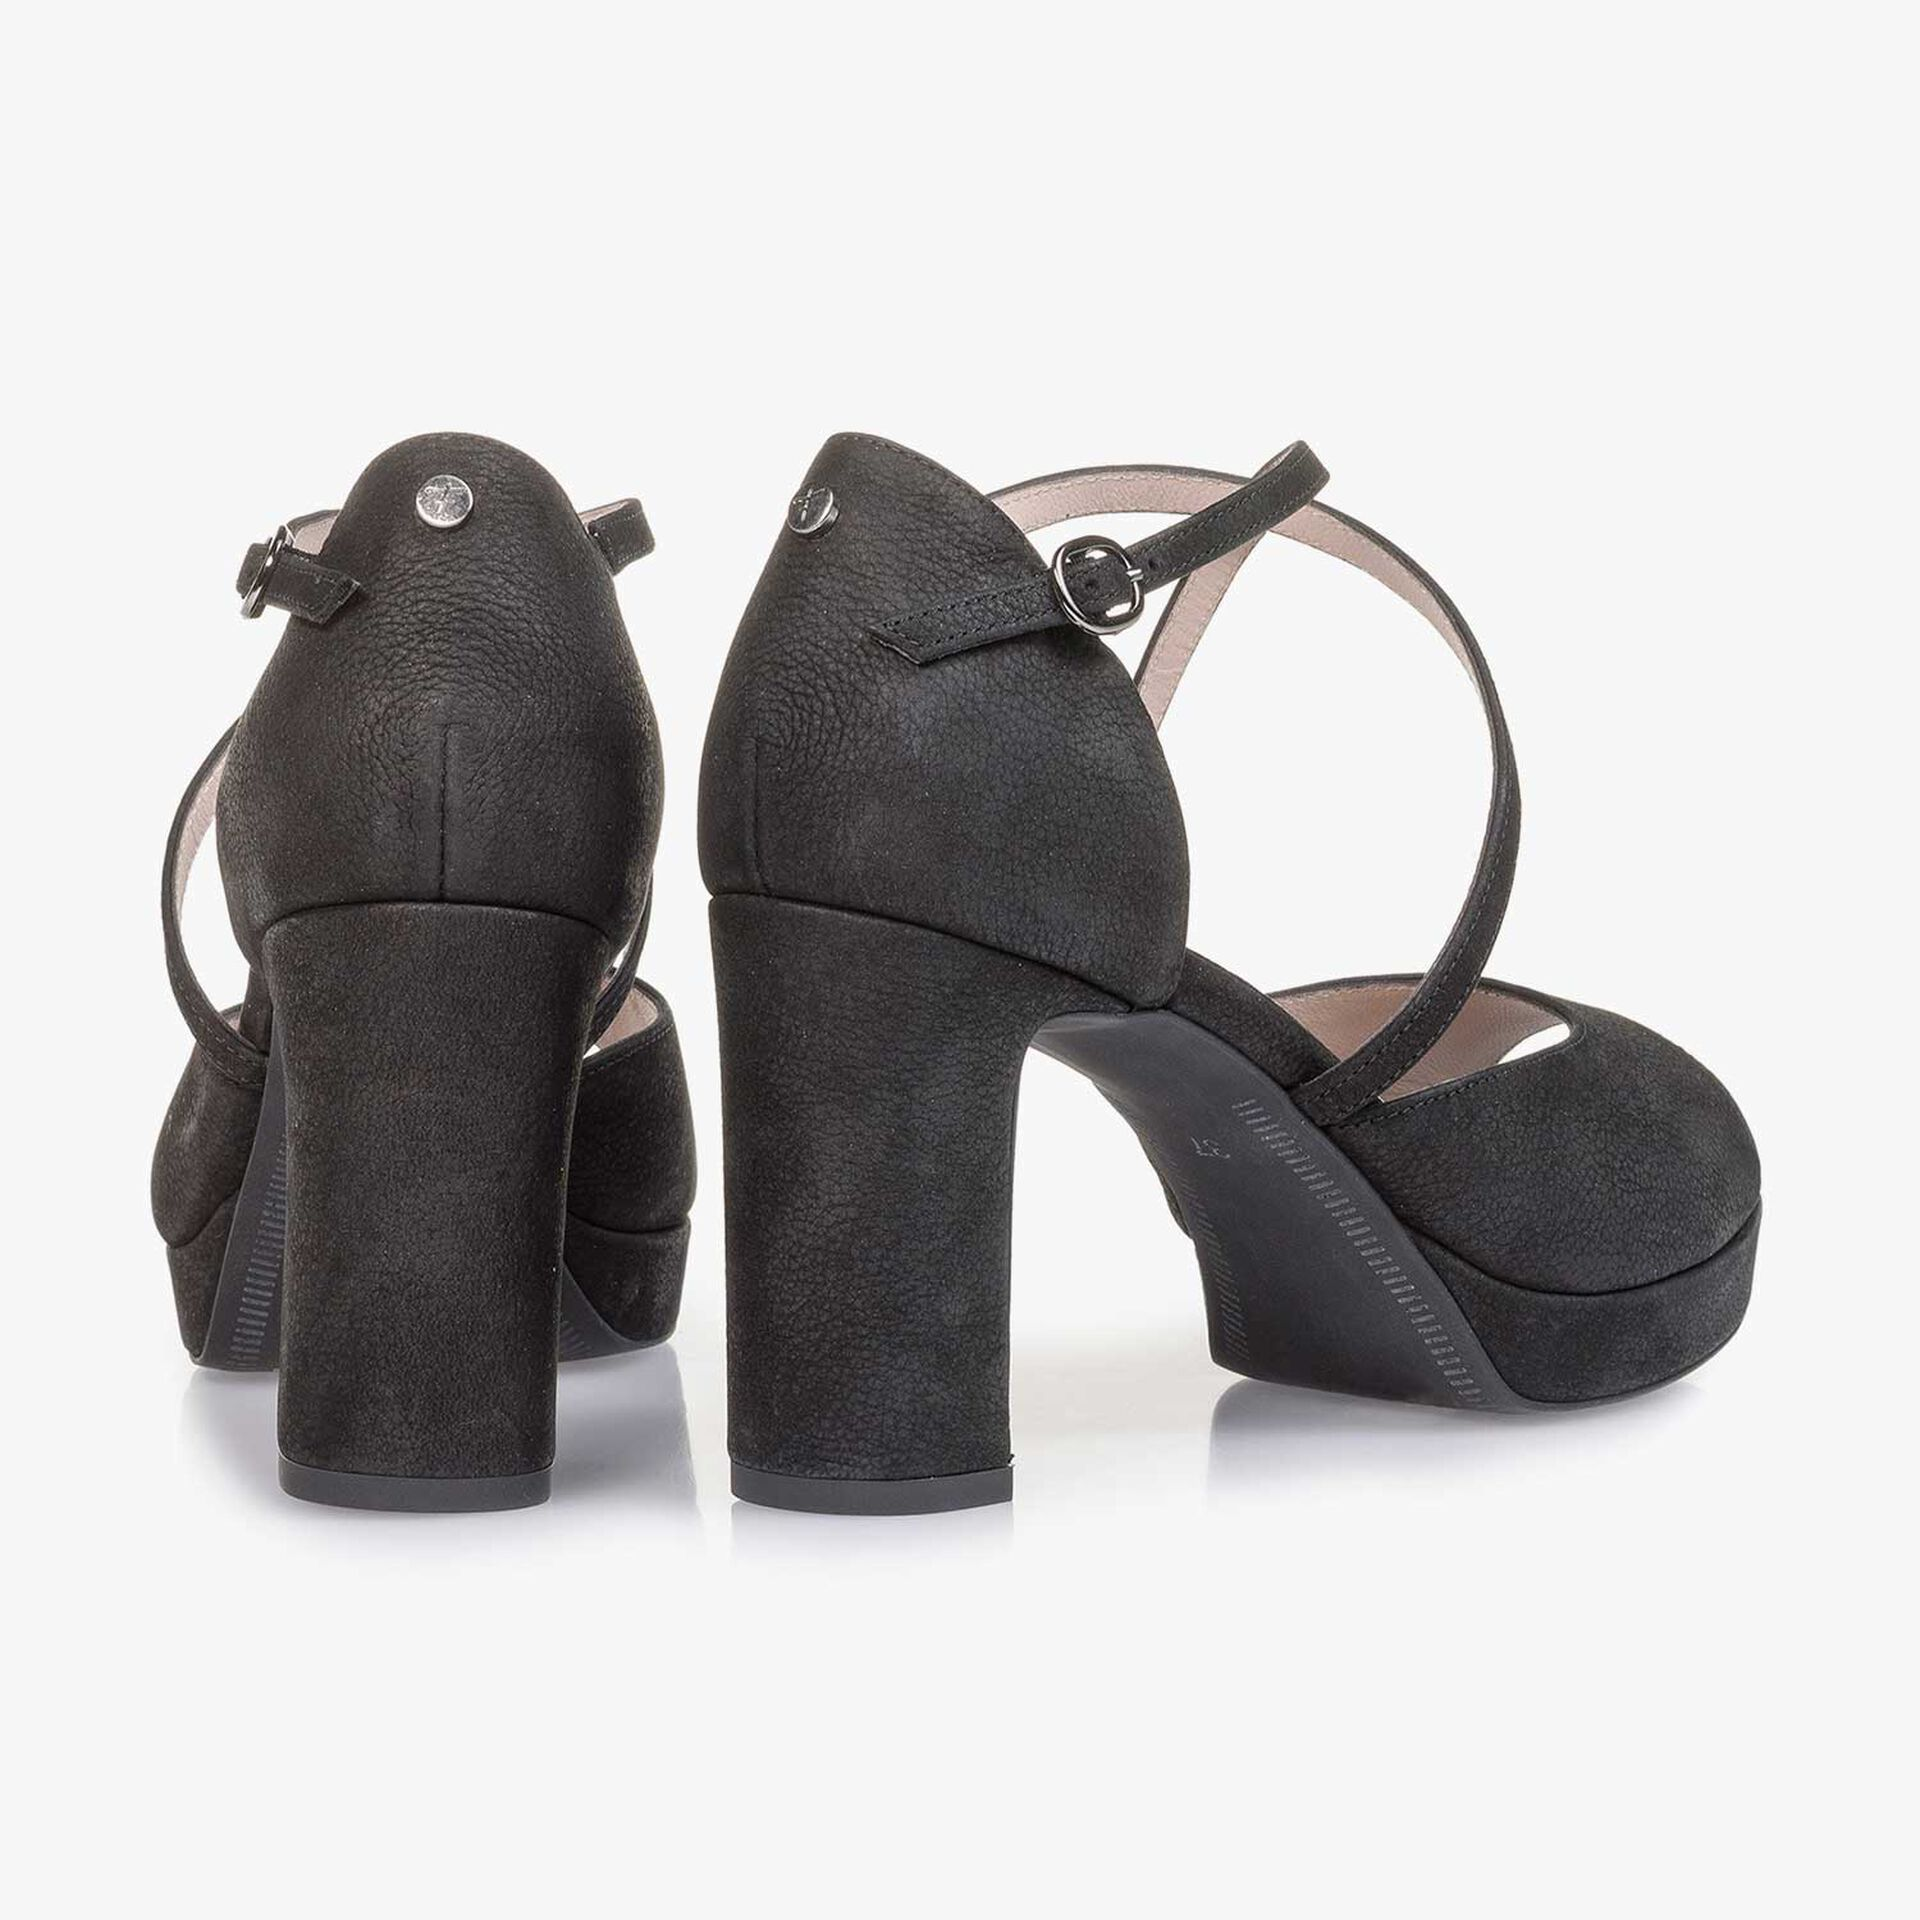 Black structured nubuck leather high-heeled sandal